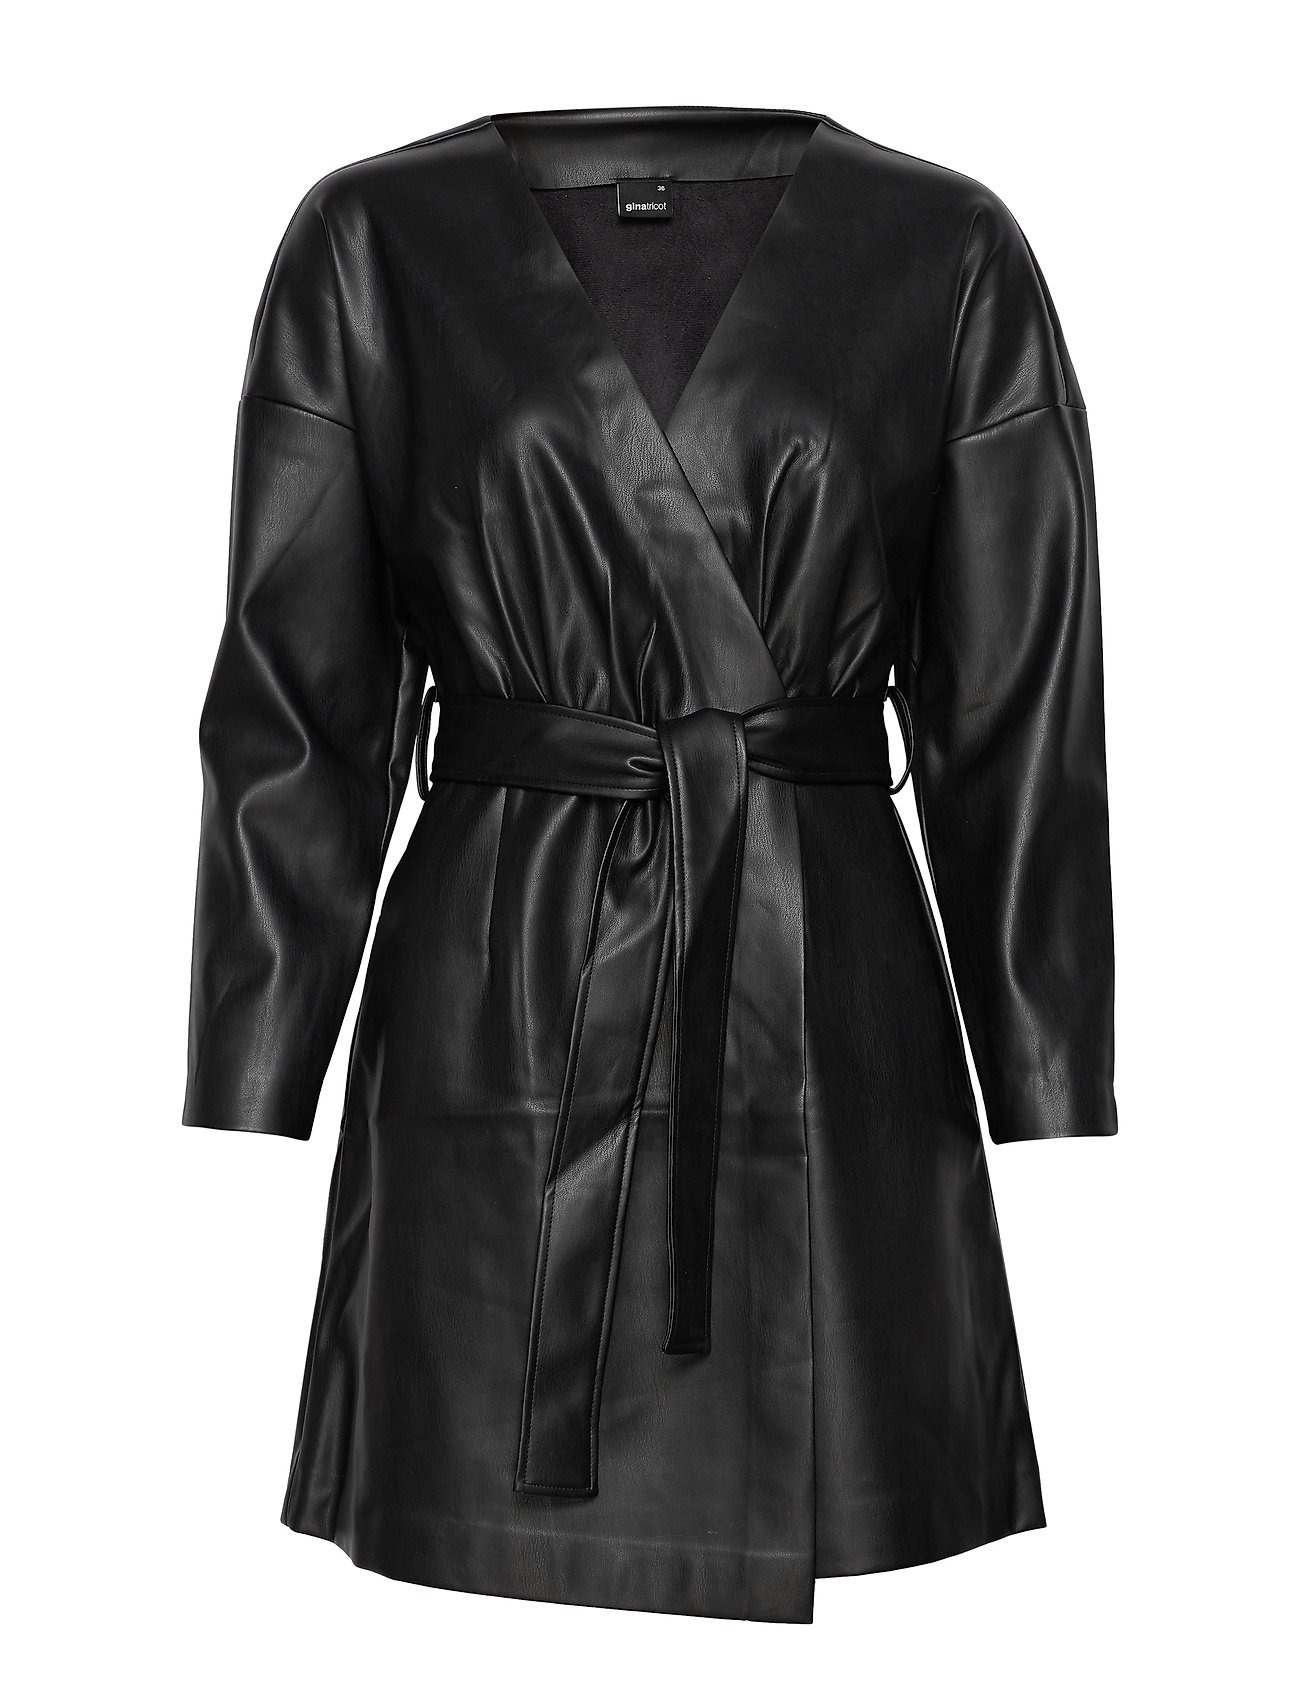 Gina Tricot Naomi pu dress - BLACK